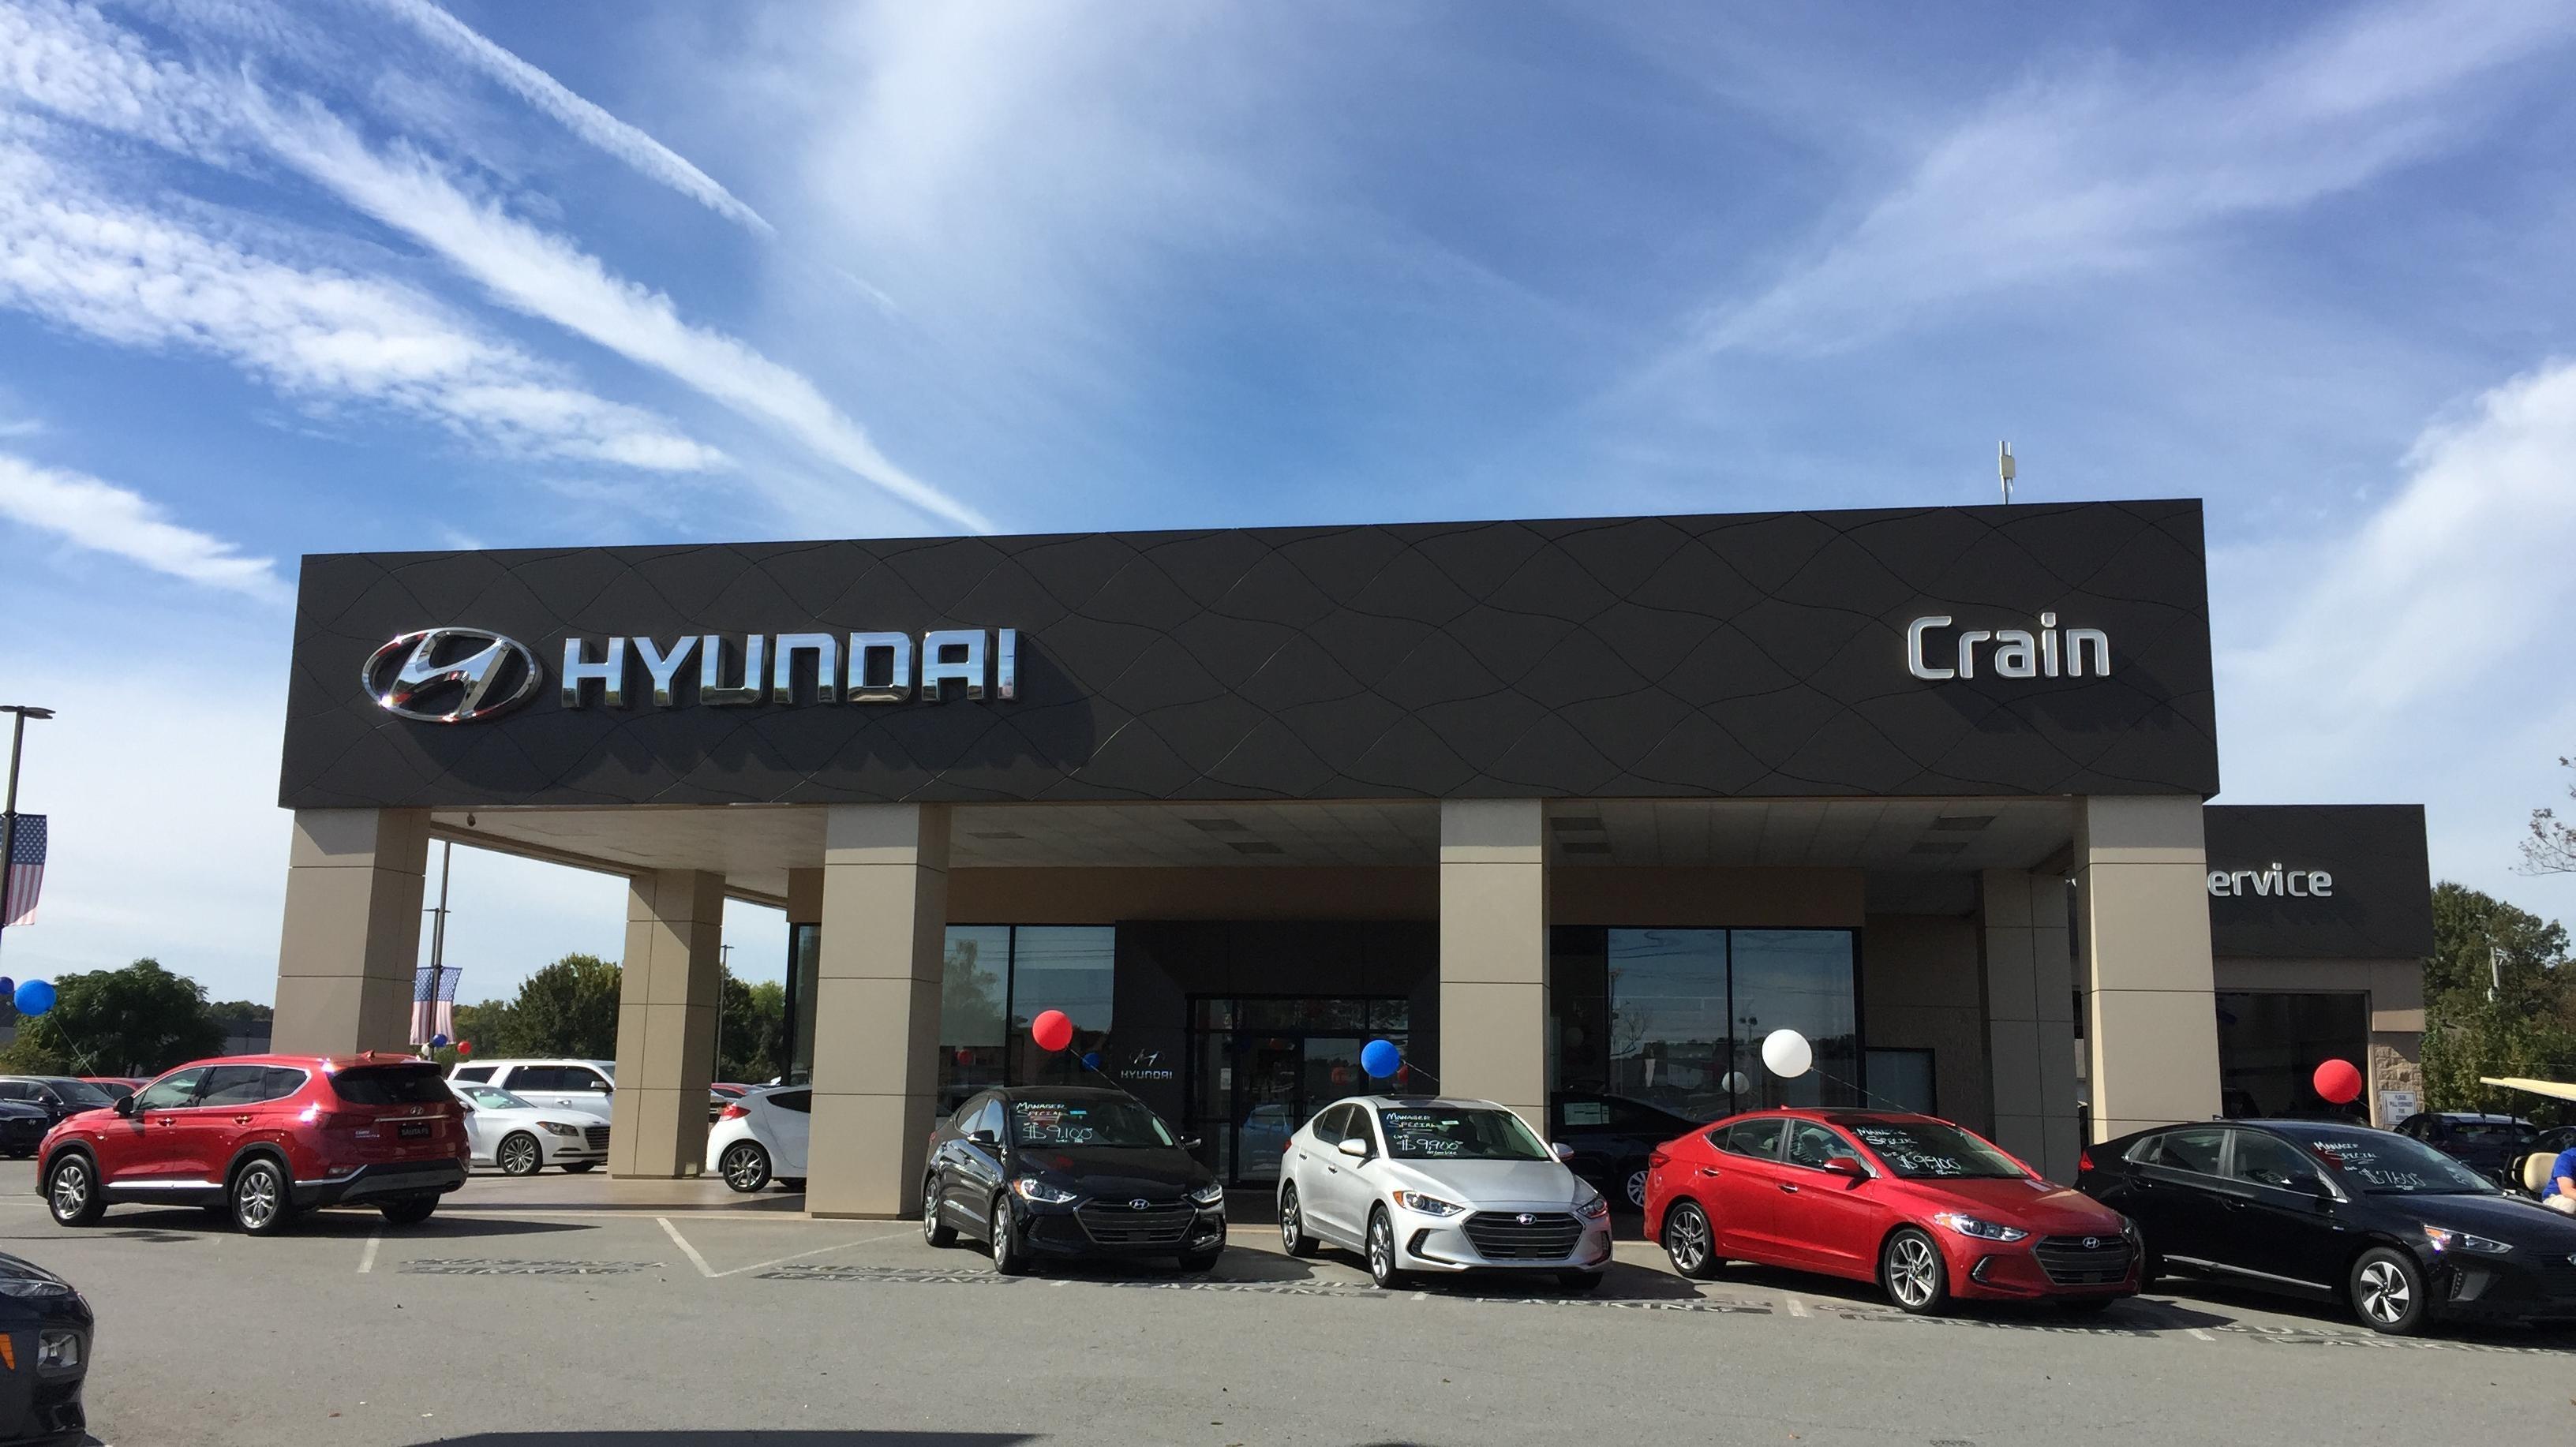 Crain Chevrolet Little Rock Ar >> Hyundai